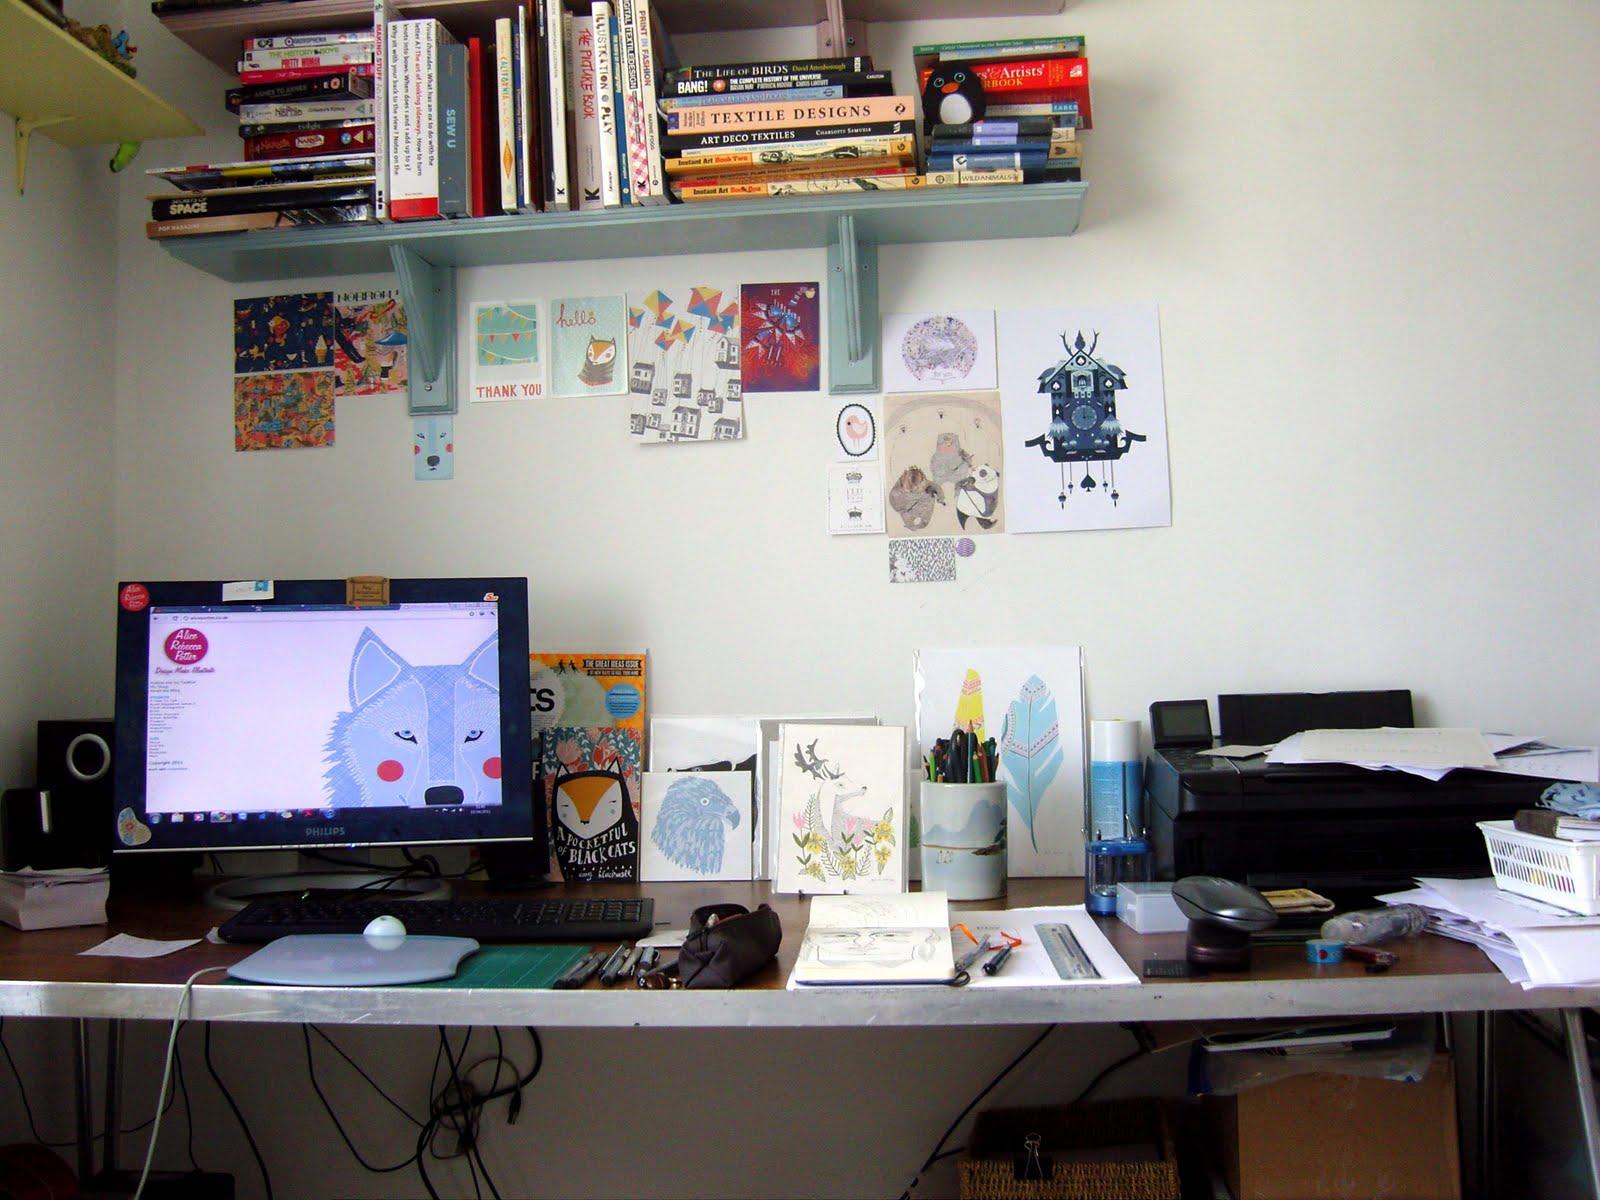 tidy desk tidy mind alice potter illustration and print design